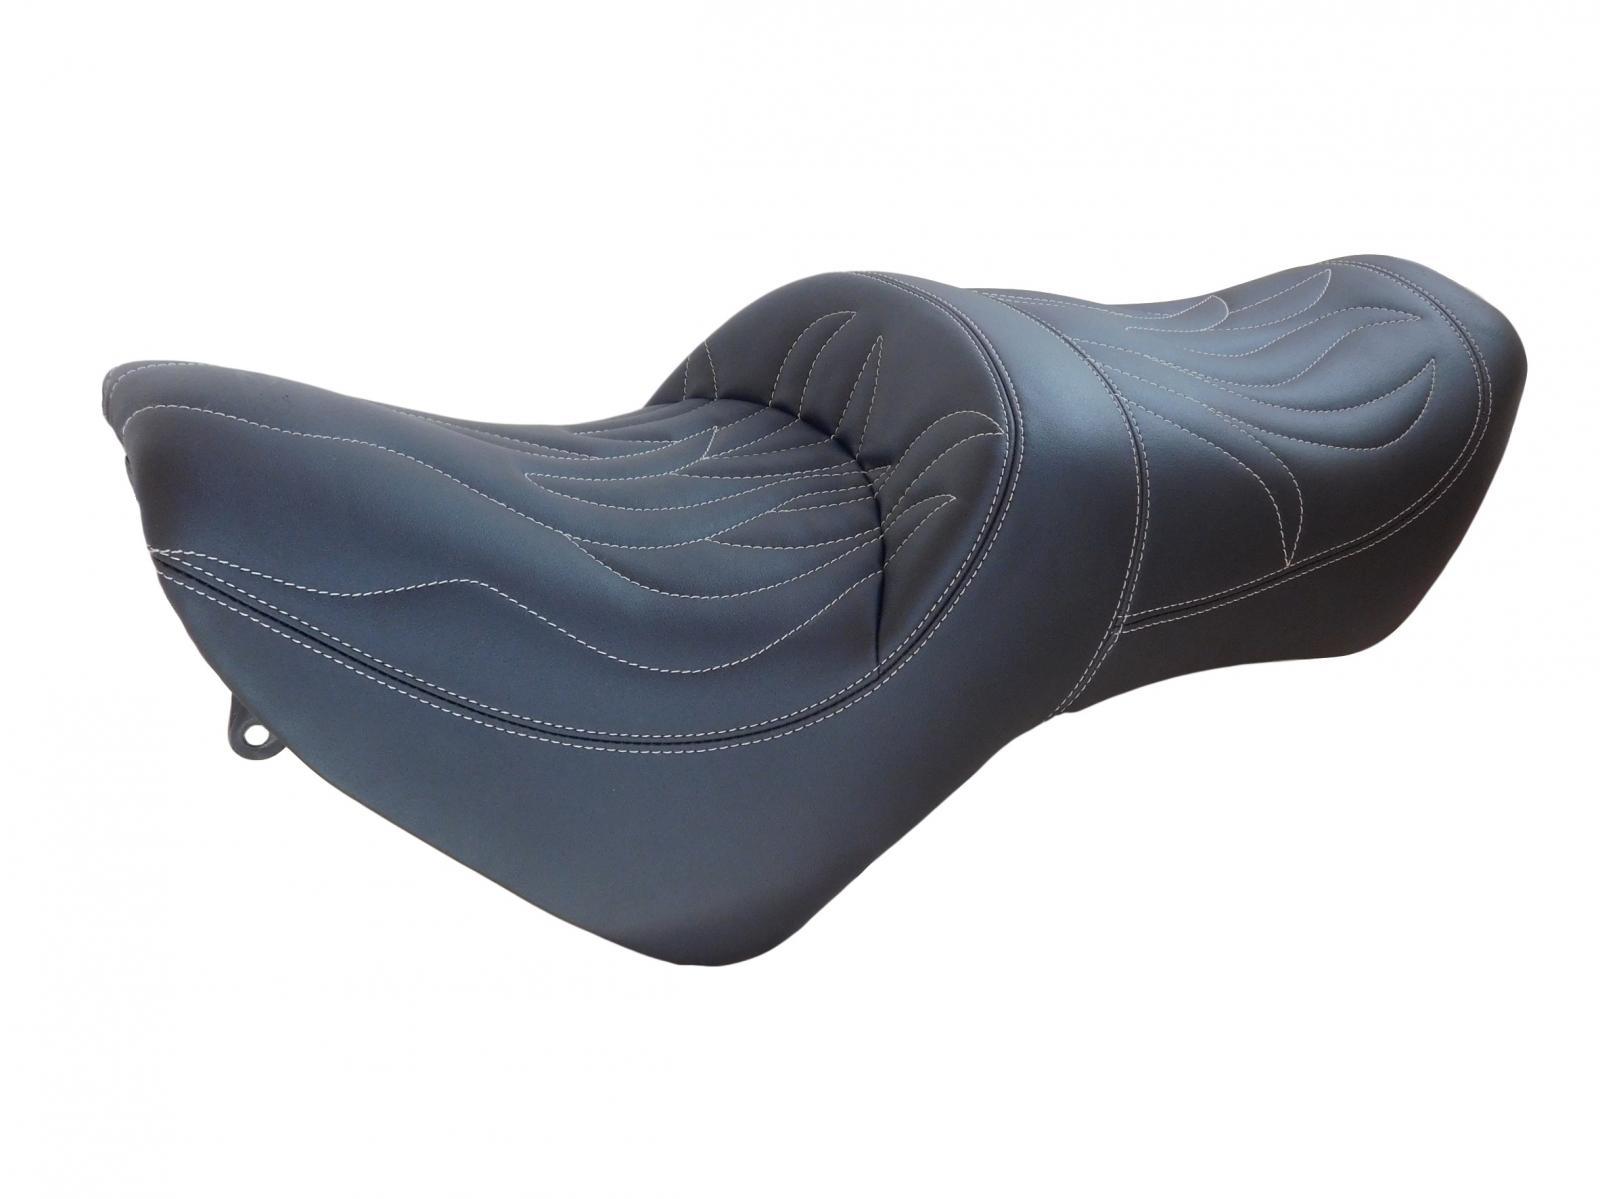 Selle Grand Confort SGC5110 - YAMAHA VIRAGO 750